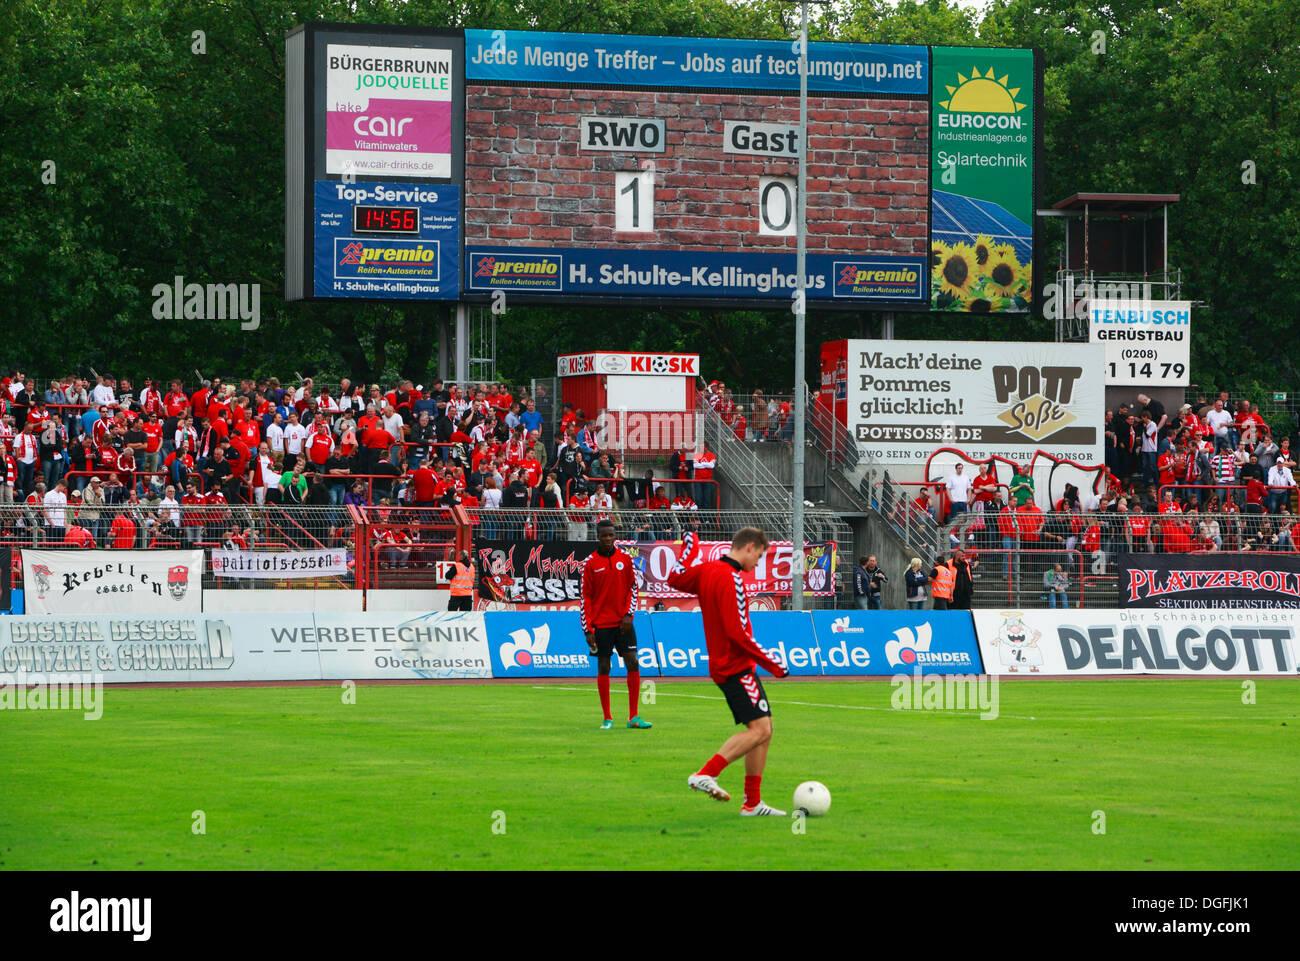 sports, football, Regional League West, 2013/2014, Rot Weiss Oberhausen versus Rot Weiss Essen 2:0, Stadium Niederrhein in Oberhausen, half-time break, score board, scoreline 1:0, stand-by players - Stock Image